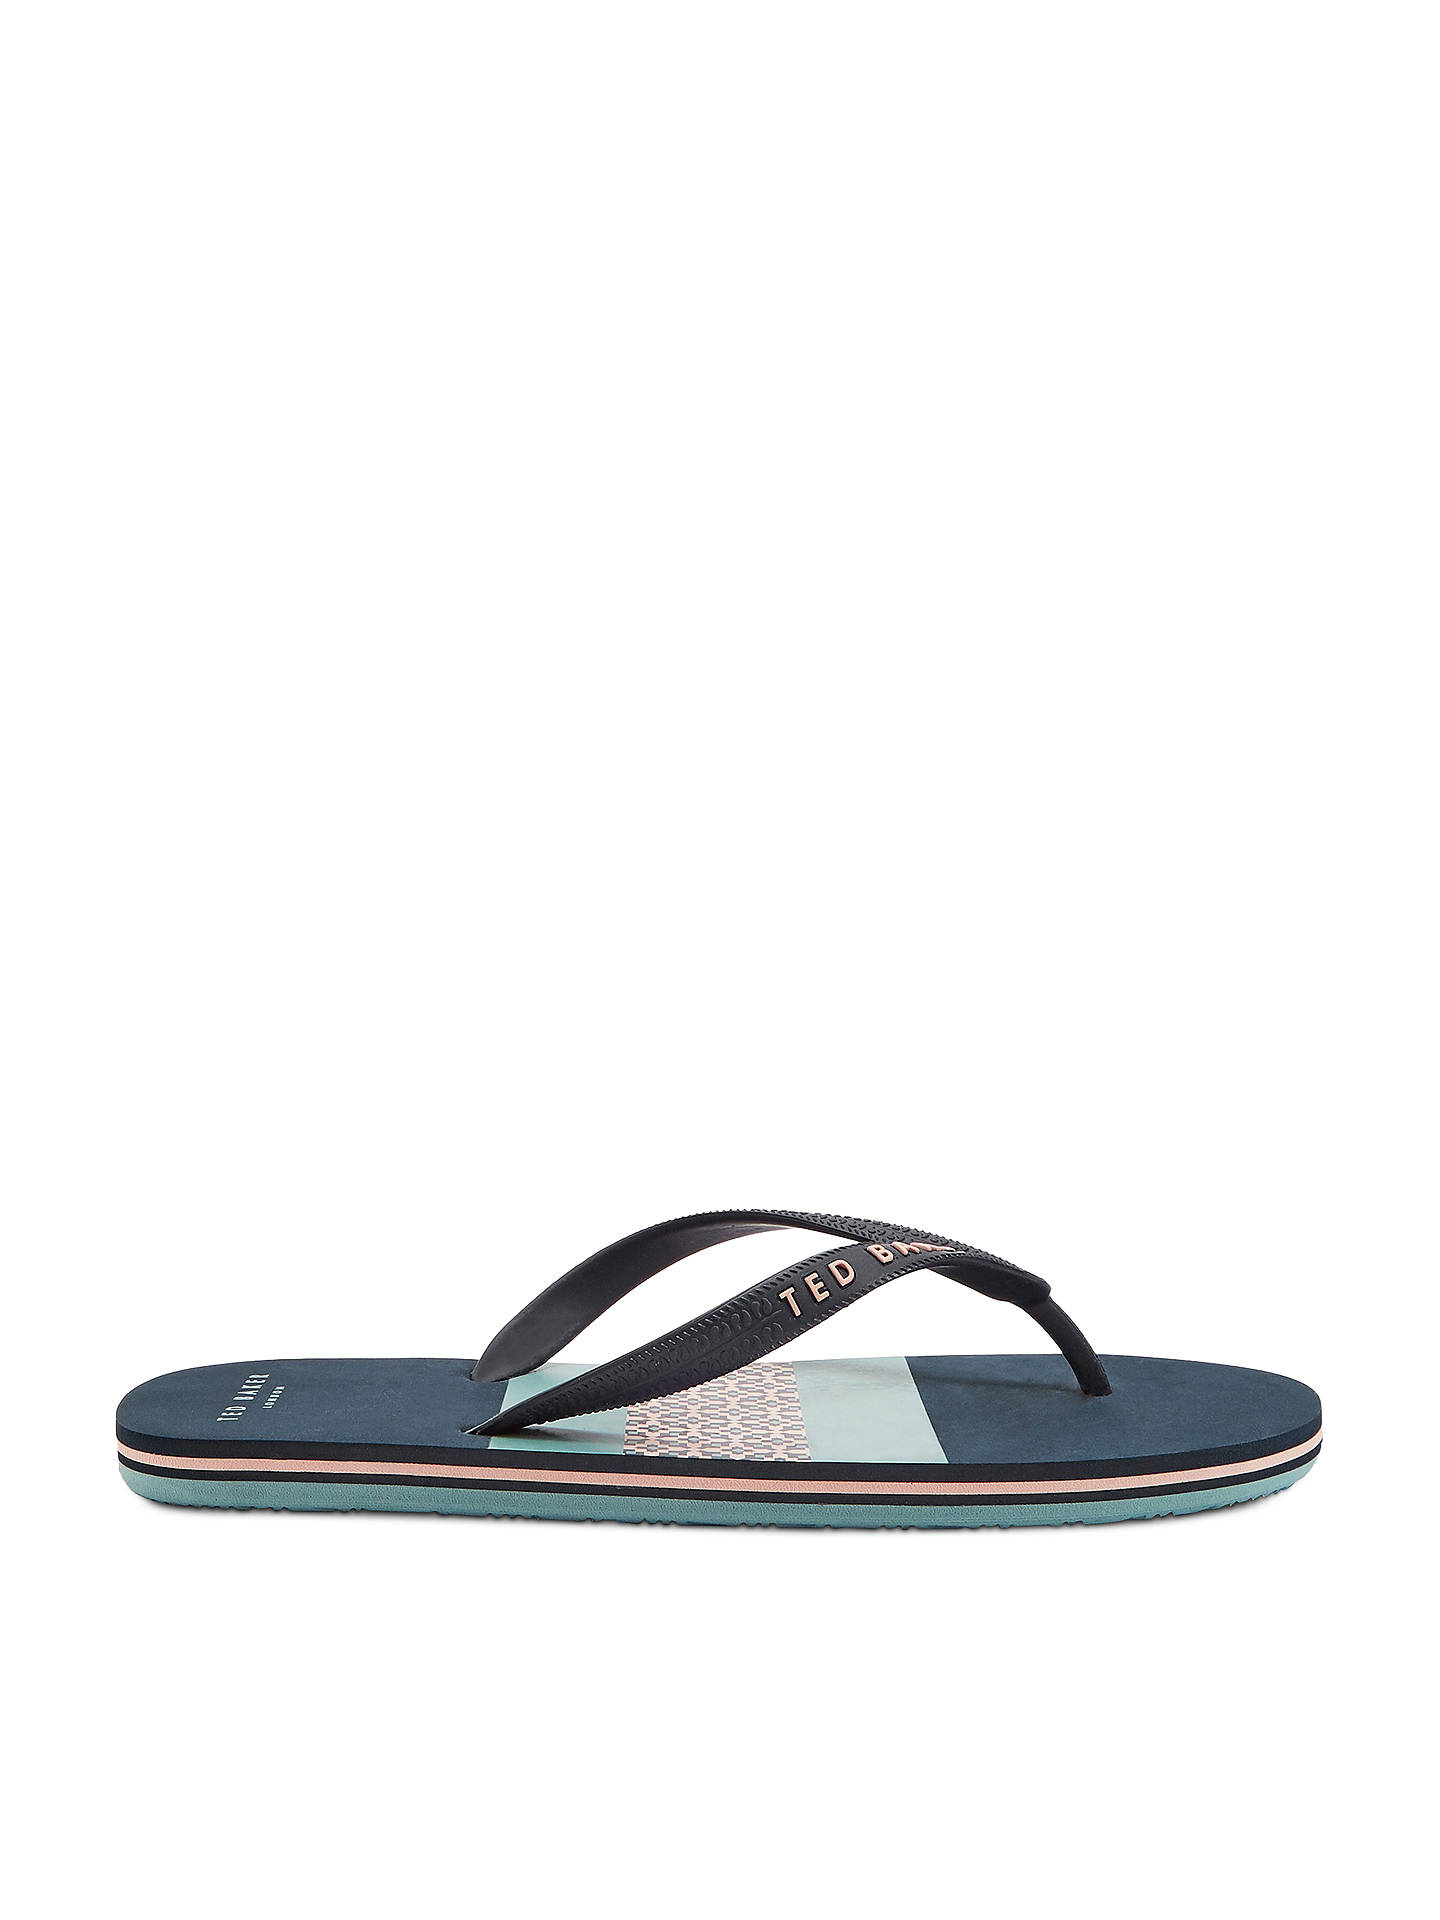 0c9291005 Buy Ted Baker Dyive Flip Flops